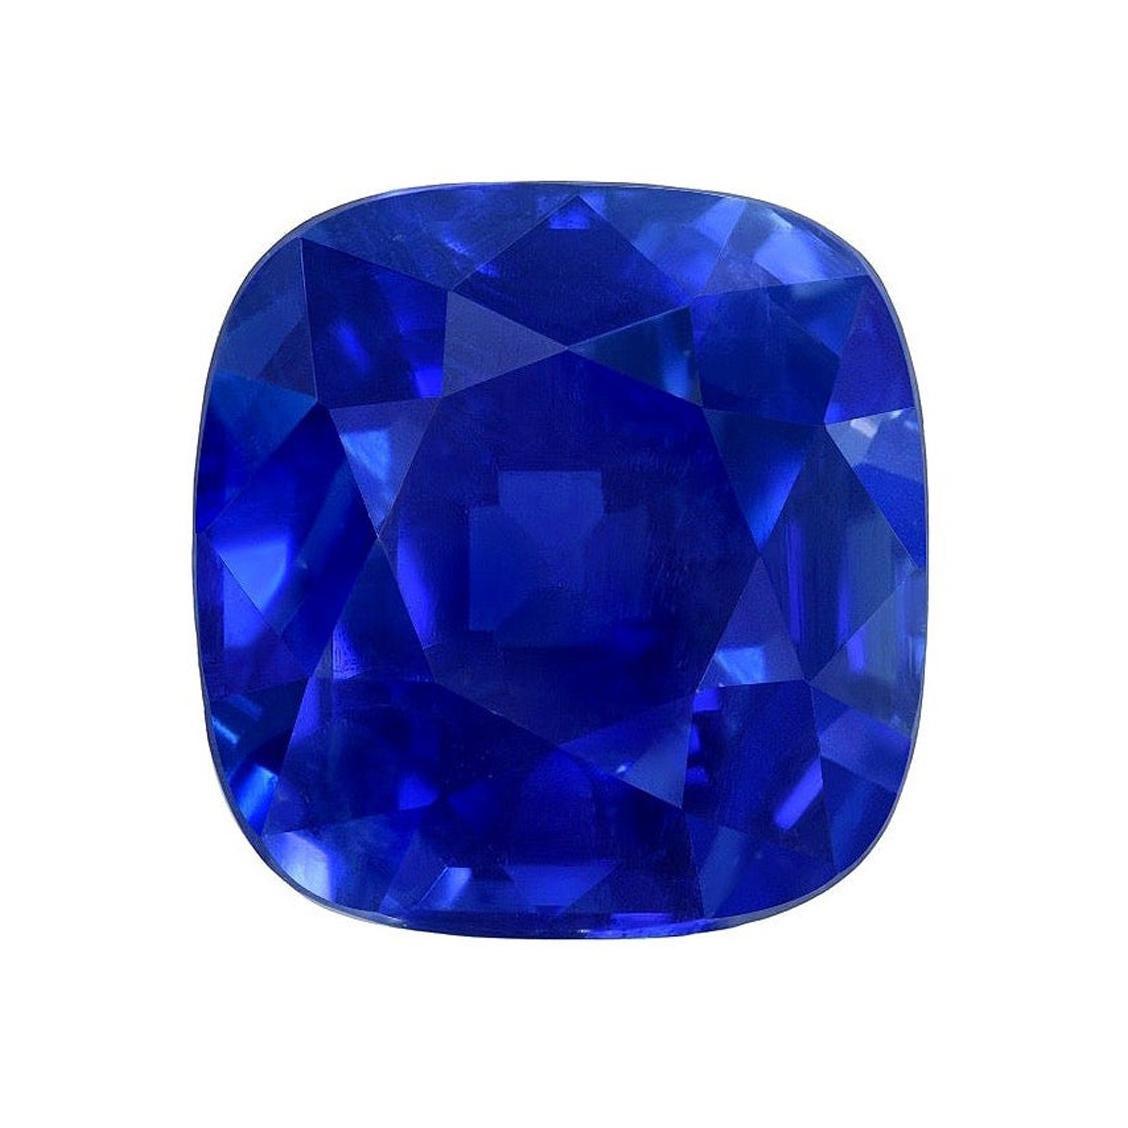 Unheated Kashmir Sapphire Ring Gem 3.34 Carat AGL Certified Loose Gemstone